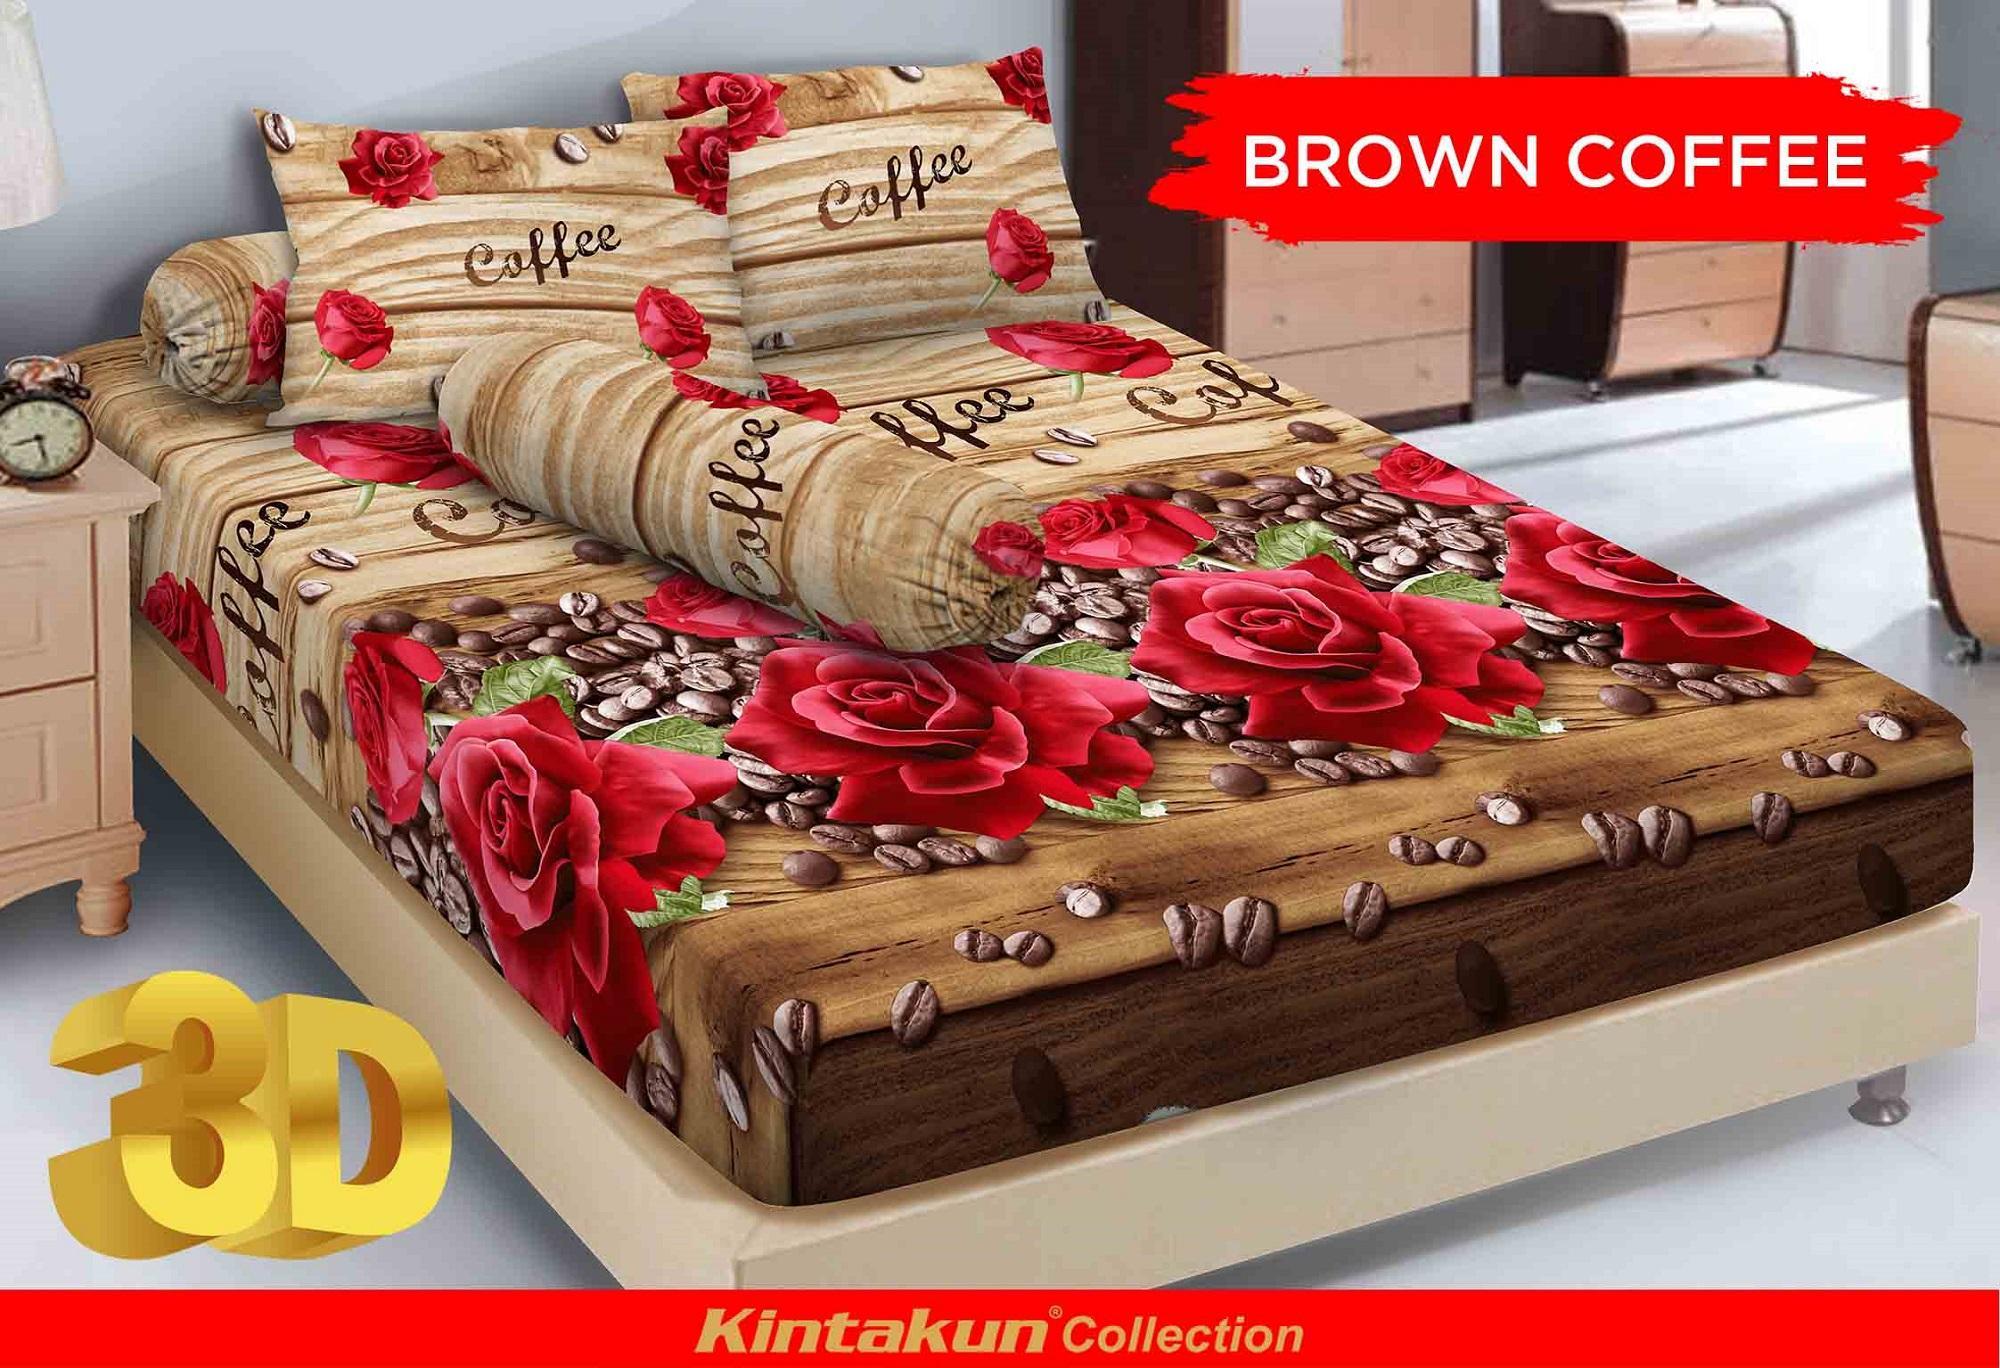 Alas Ranjang Berkualitas Murah Kintakun Luxury Sprei 180x200 B2 King The Royals Dluxe 180x200cm Brown Coffee